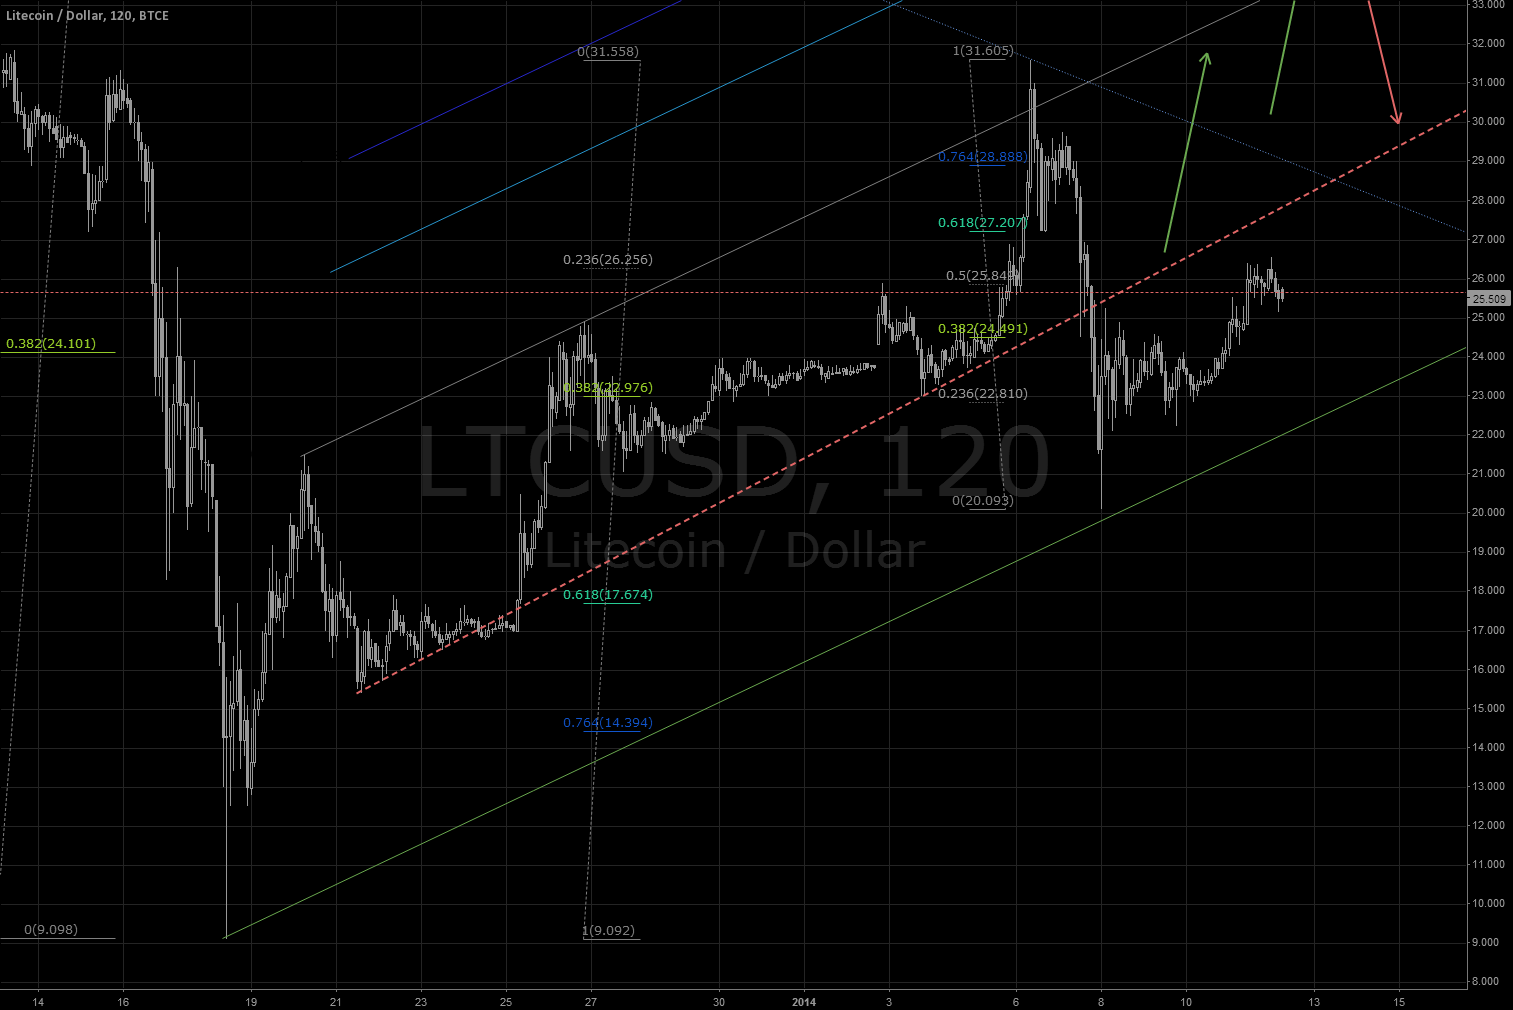 LTC / USD: Challenging resistance @ 27 USD